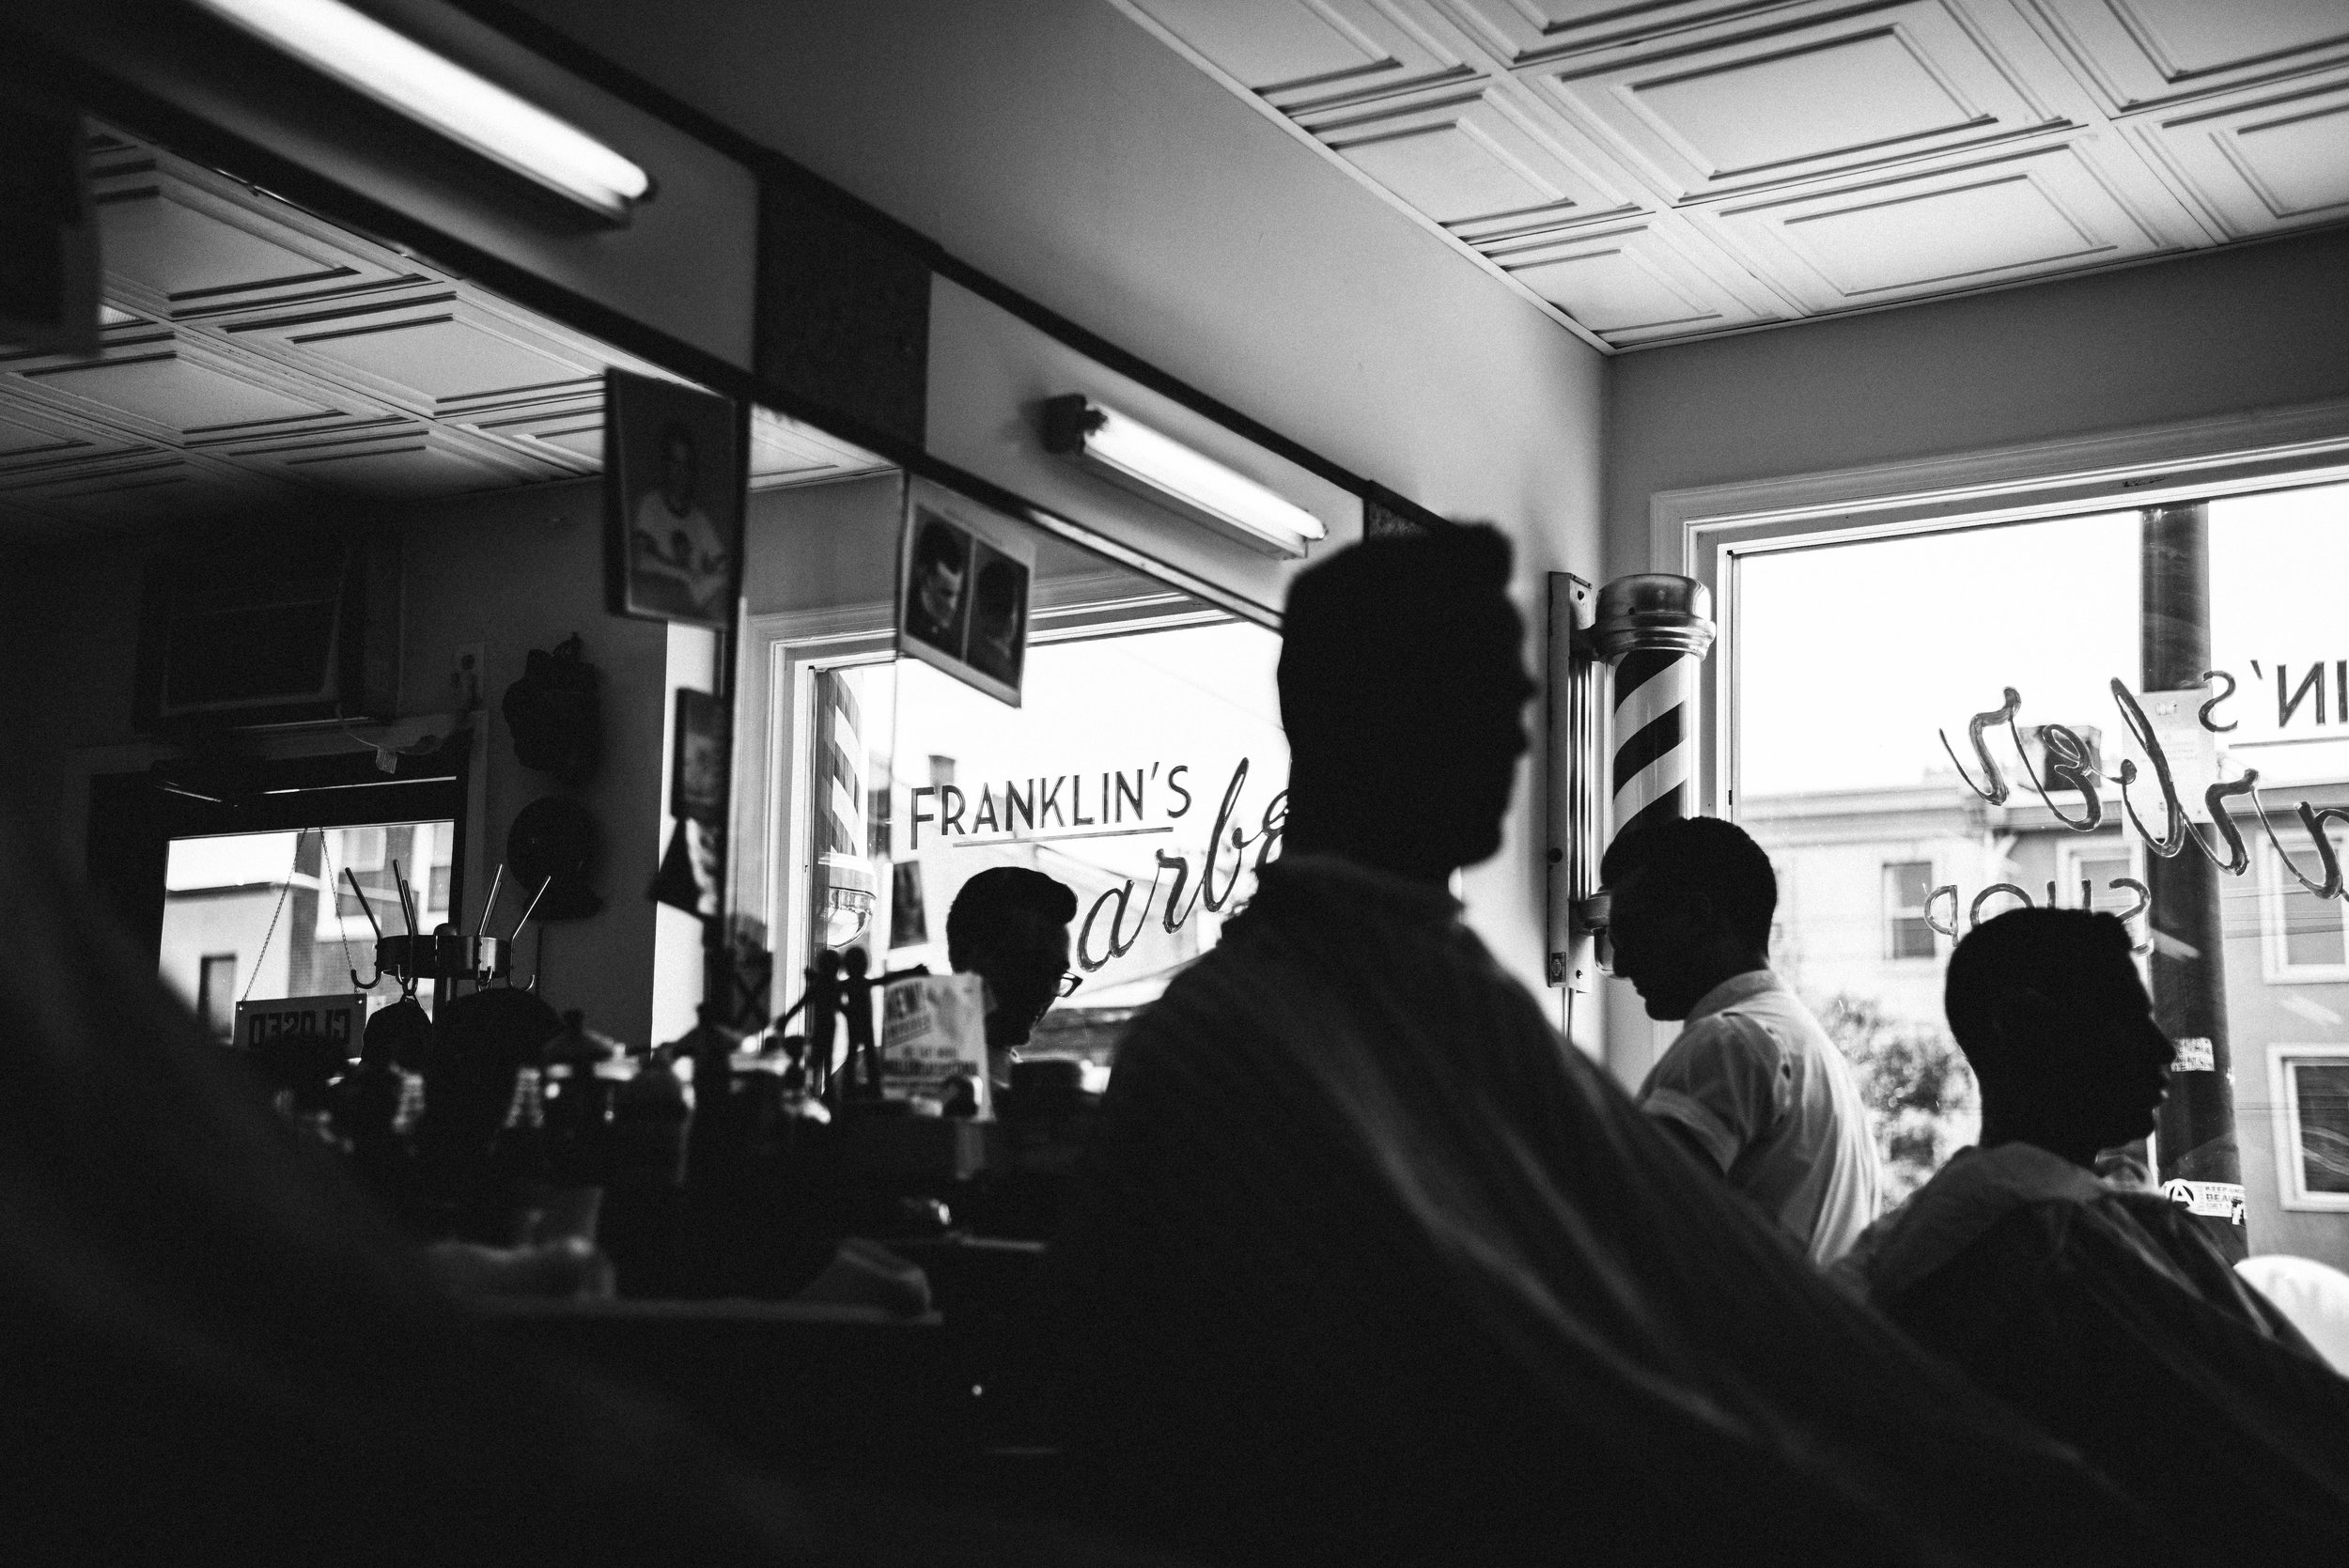 fishtown-northern-liberties-philadelphia-traditional-barber-shop-shaves.jpg